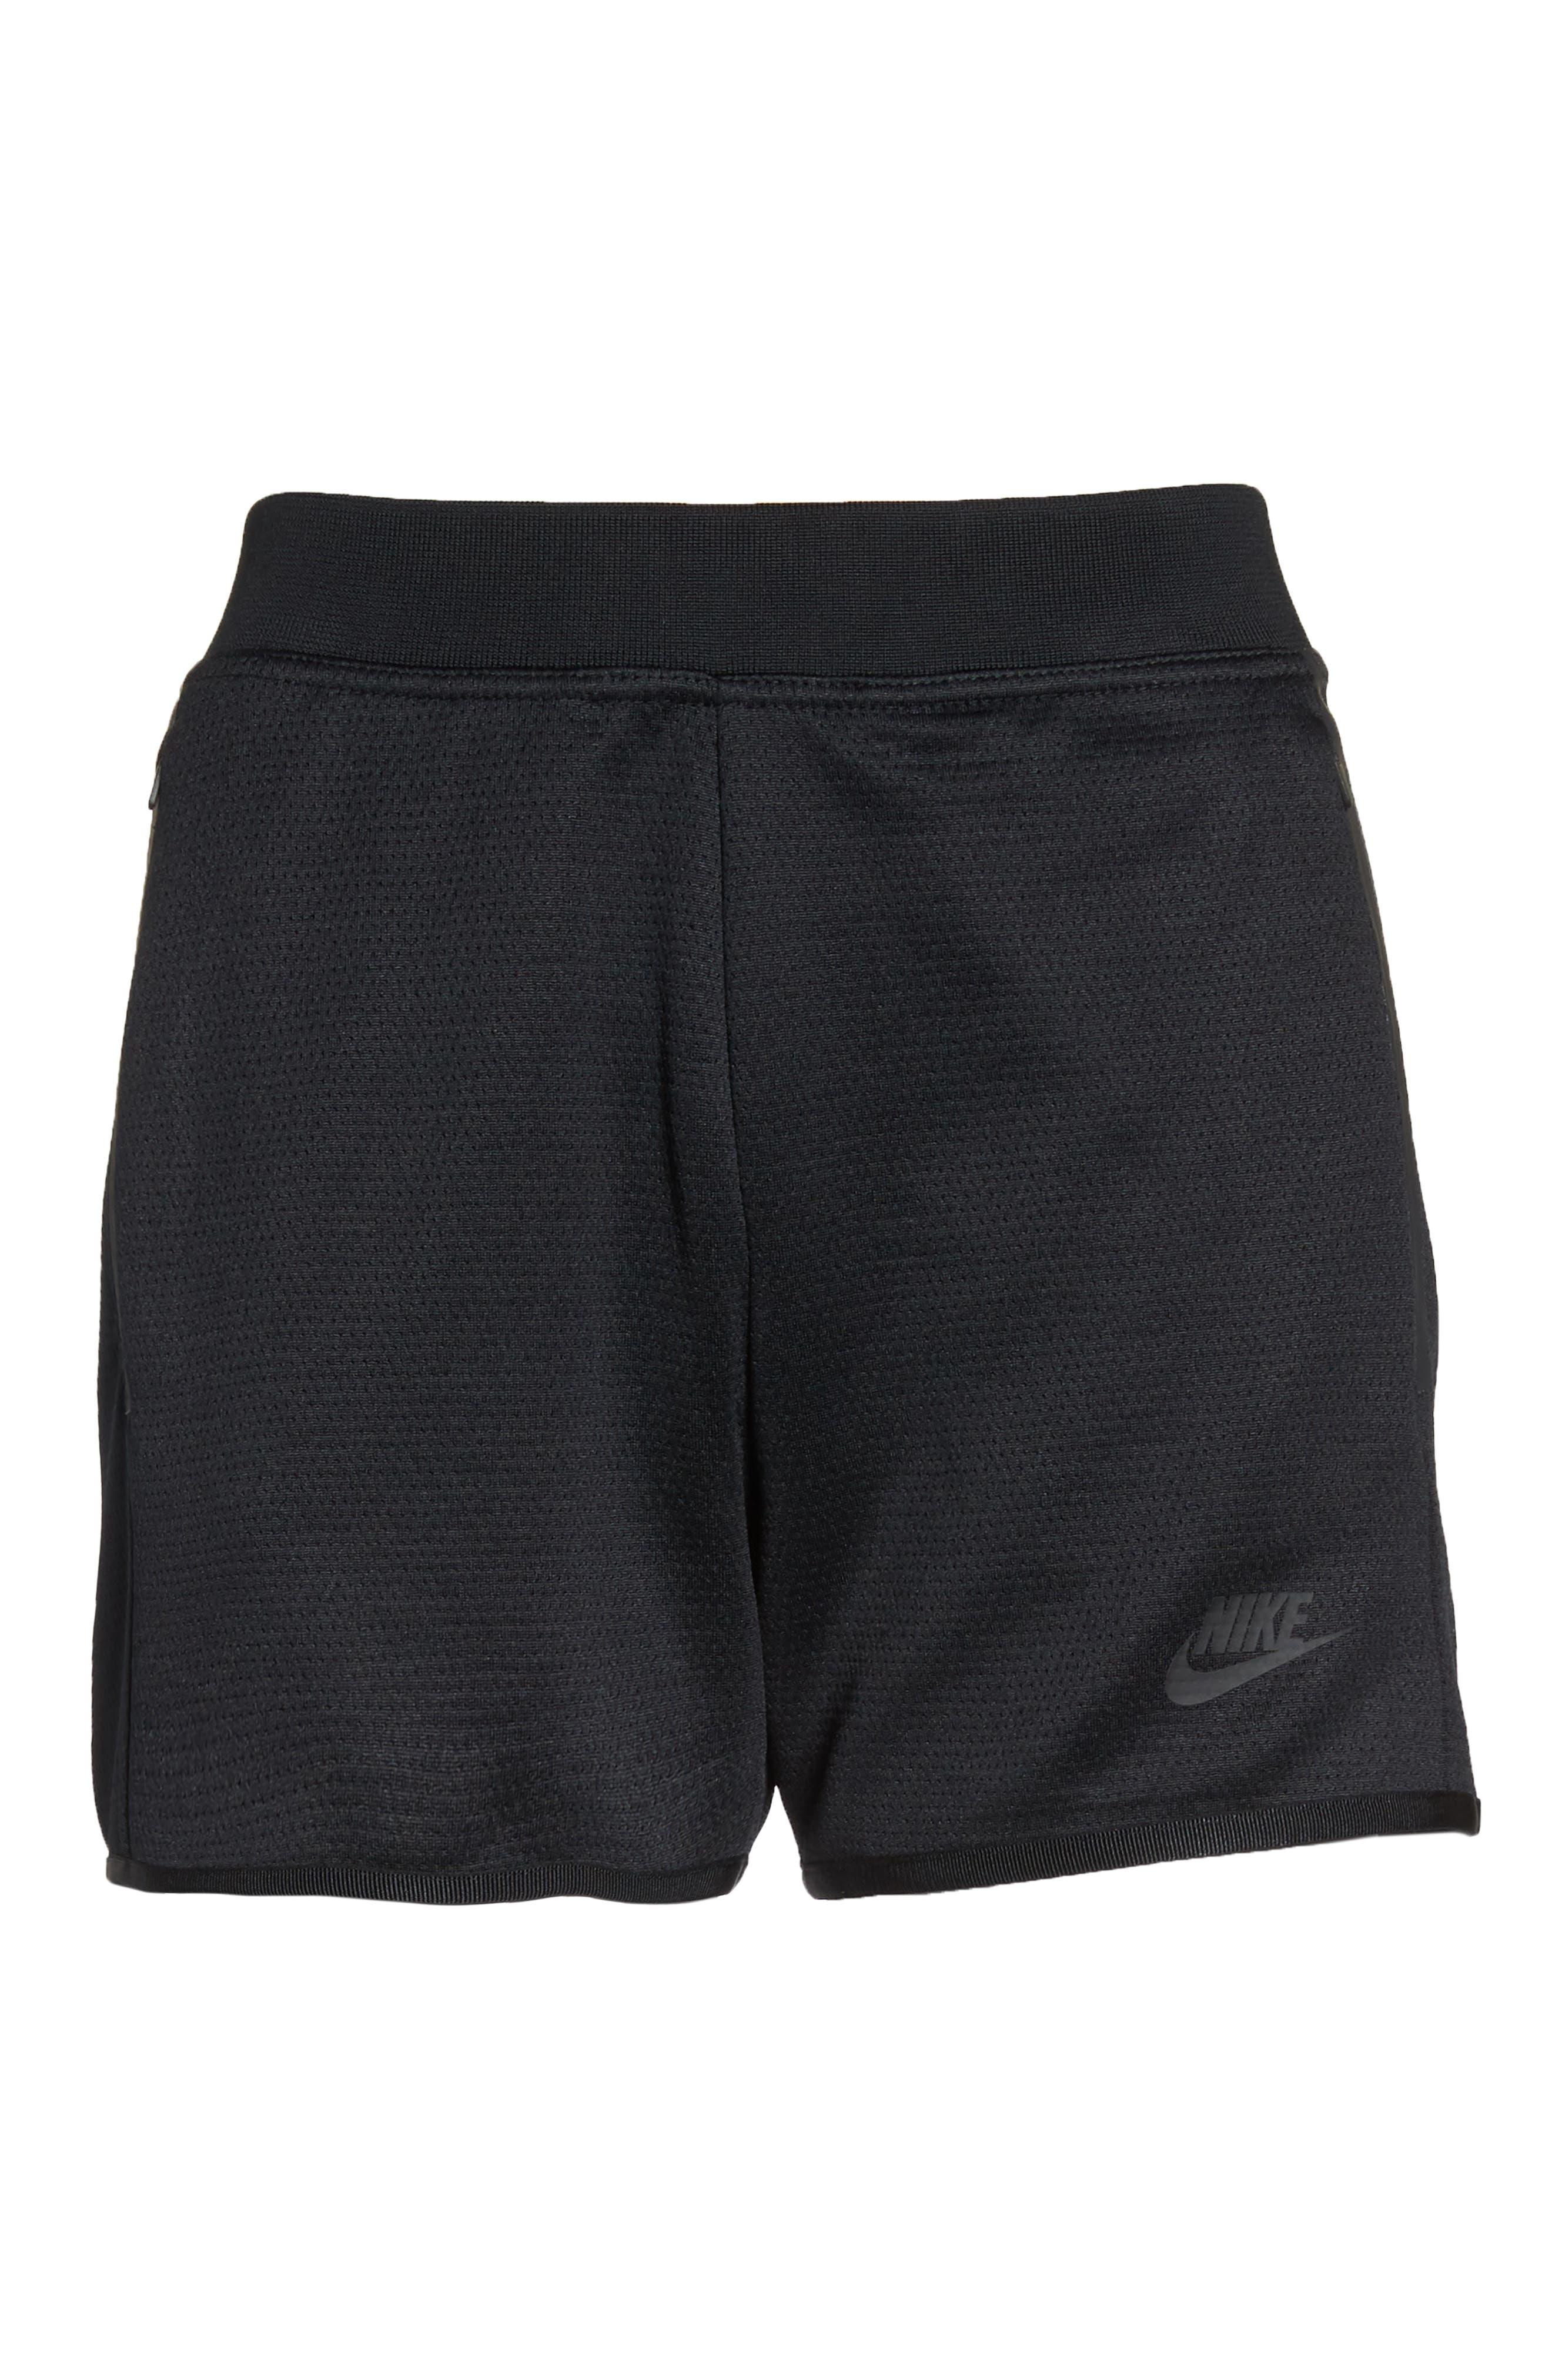 Sportswear Tech Fleece Short,                             Alternate thumbnail 7, color,                             010